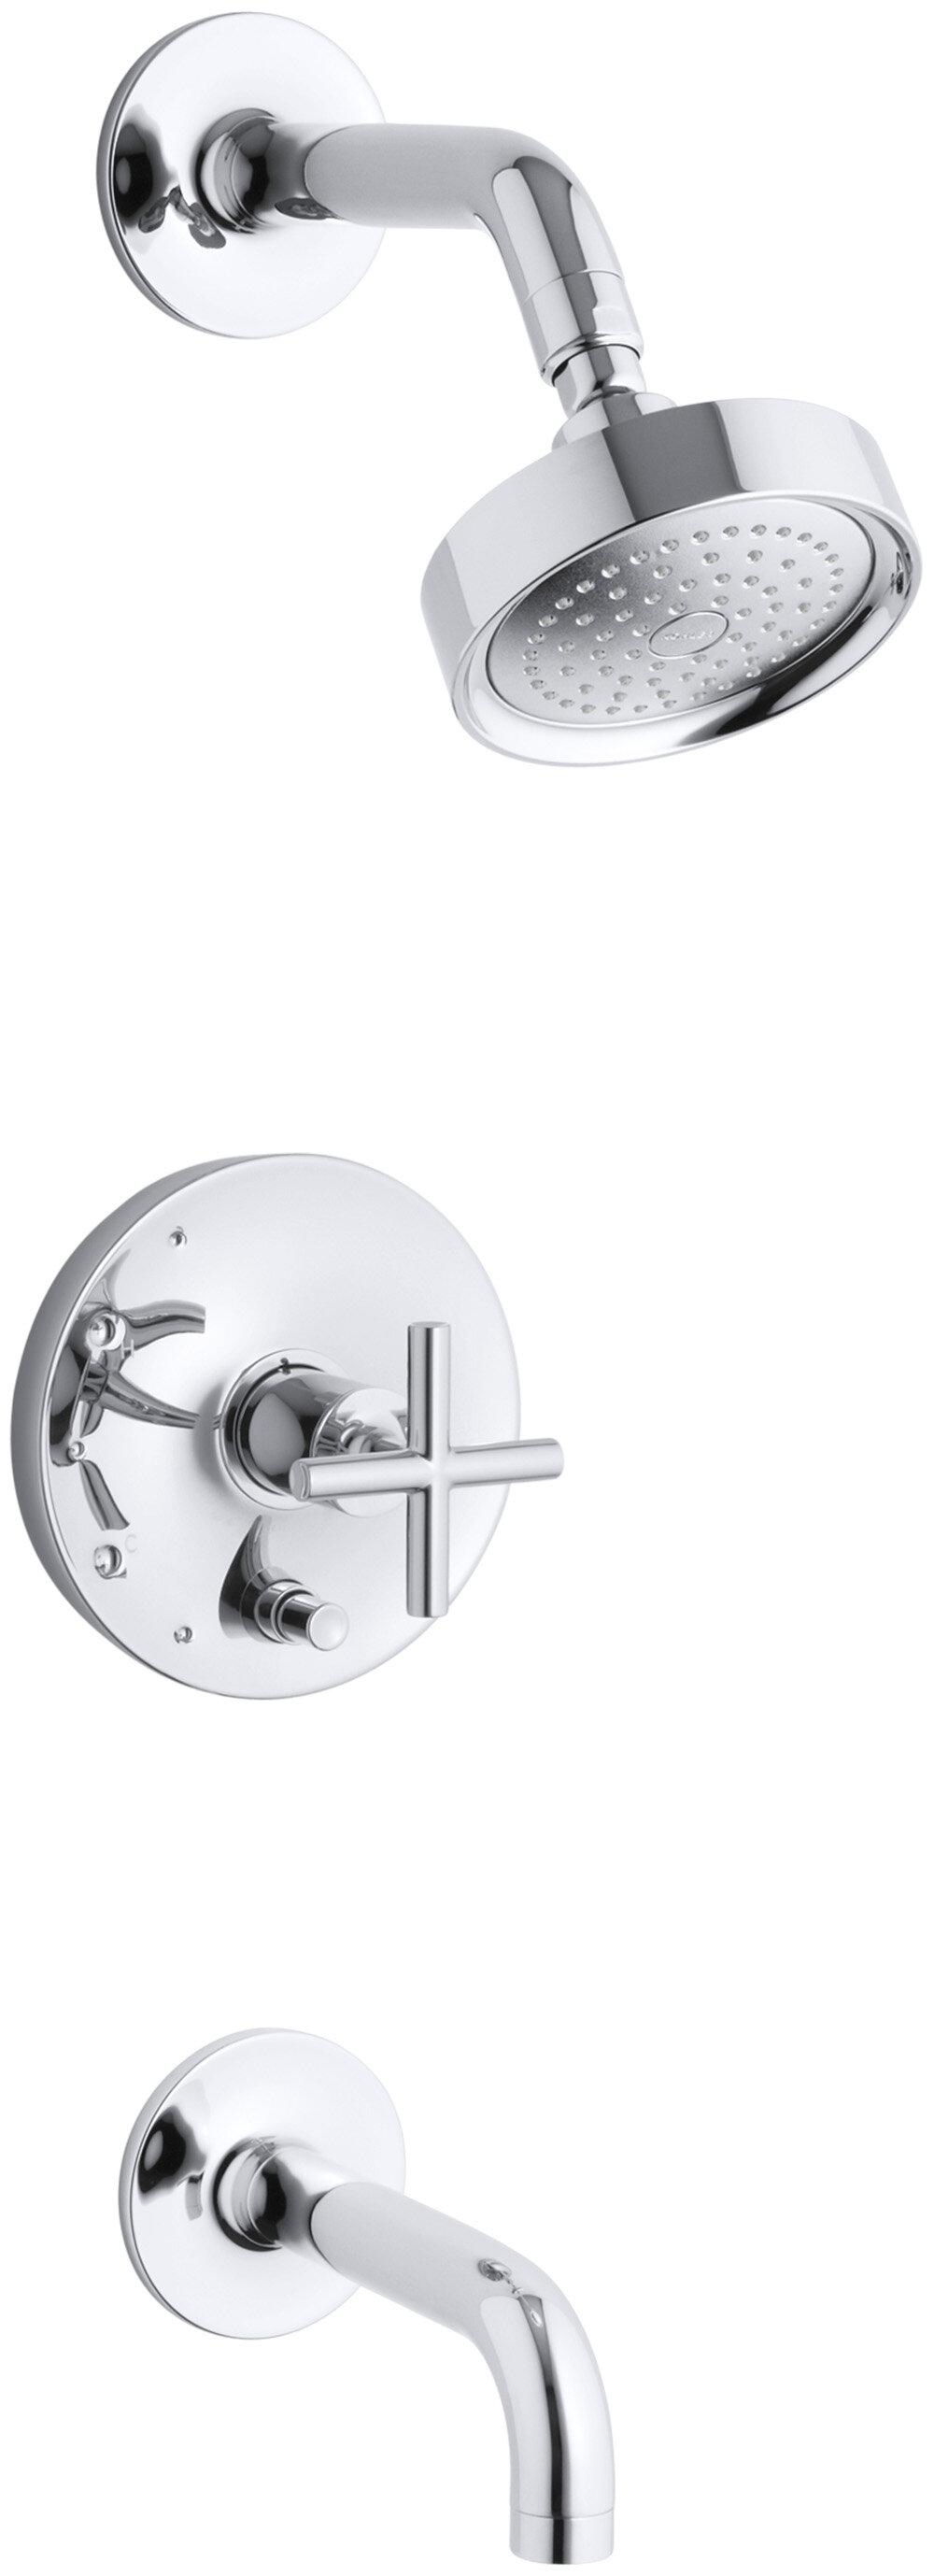 faucets high amazon sink bathroom arc com eva valve tub roman moen two faucet handle dp without hand chrome and shower